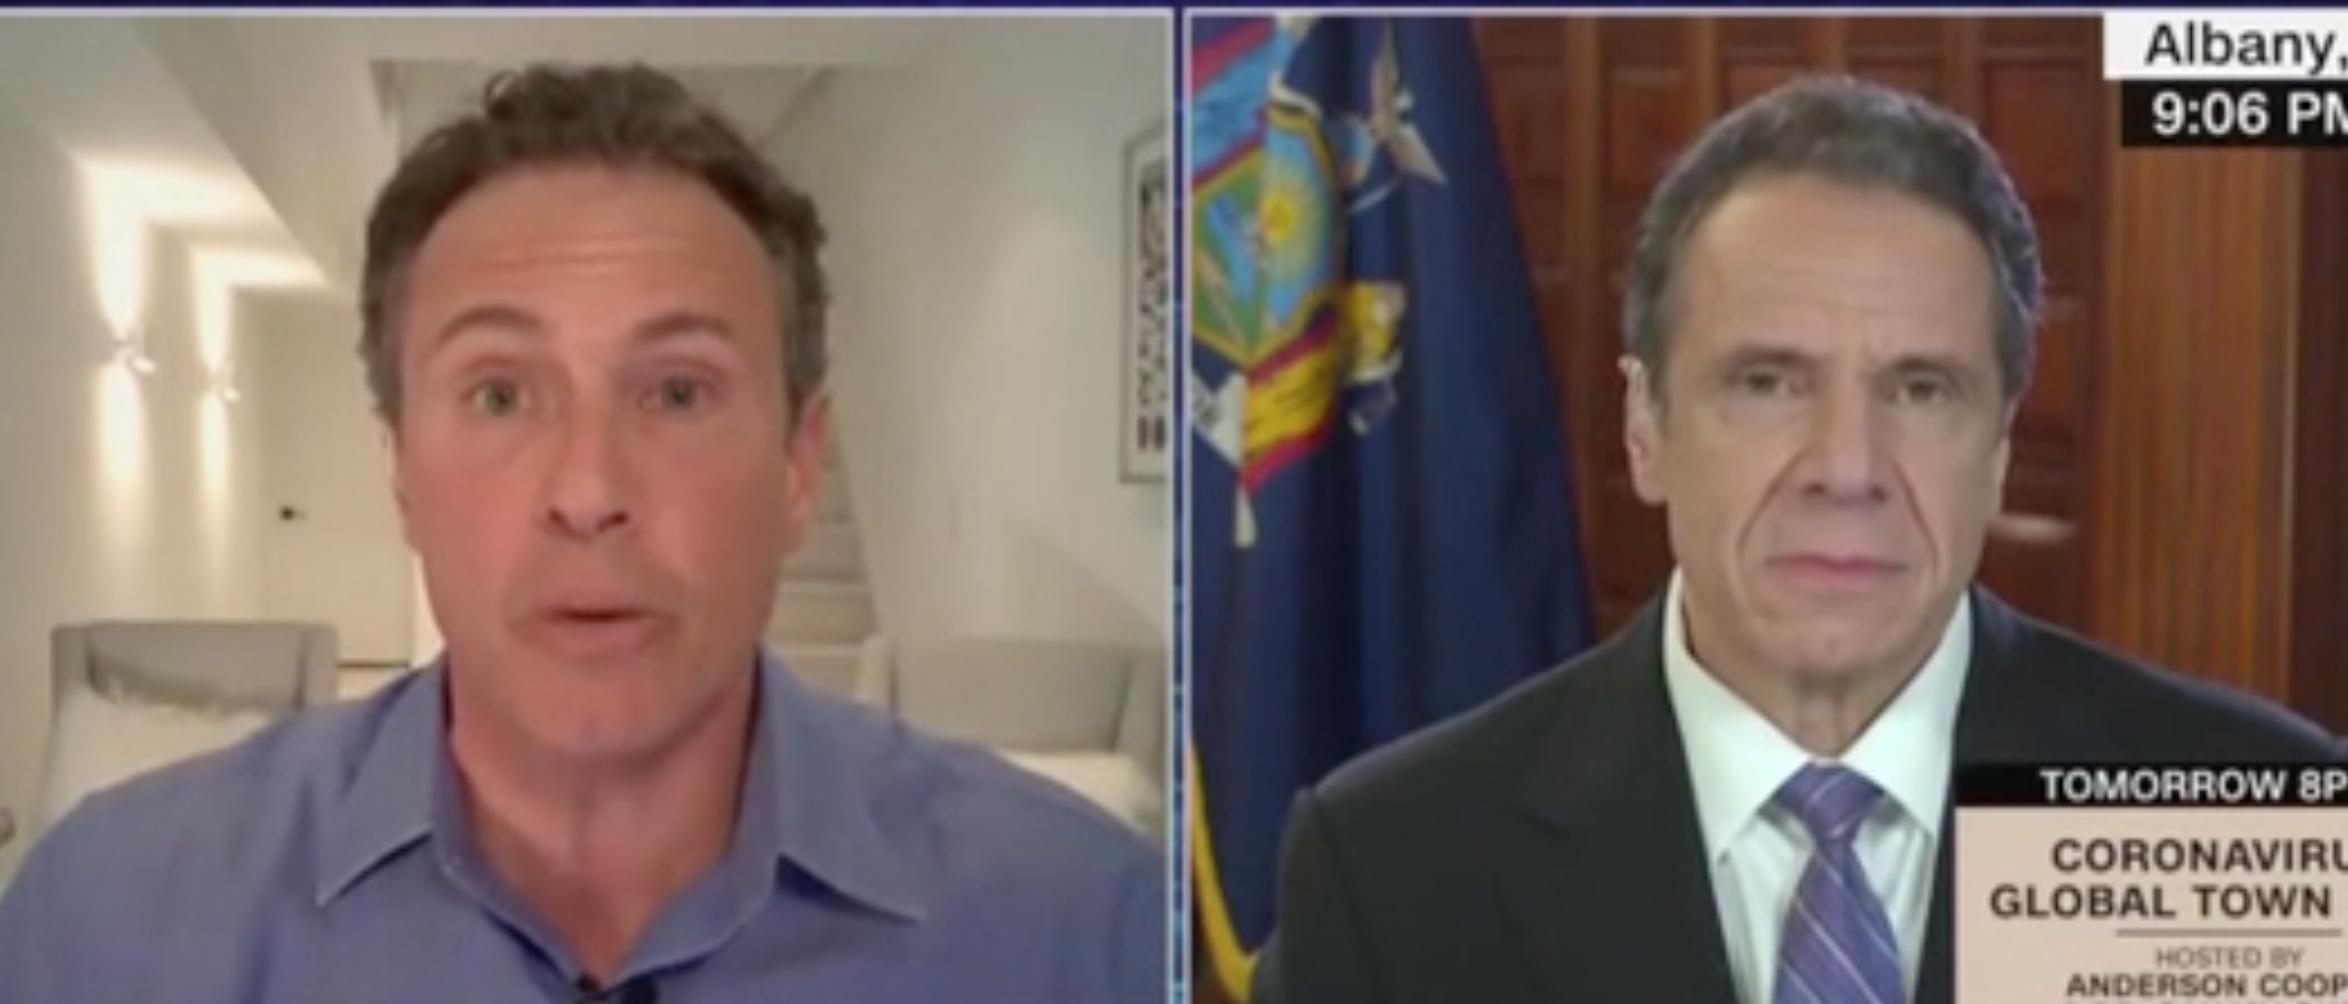 Chris Cuomo and Andrew Cuomo appear on CNN. Screenshot/CNN